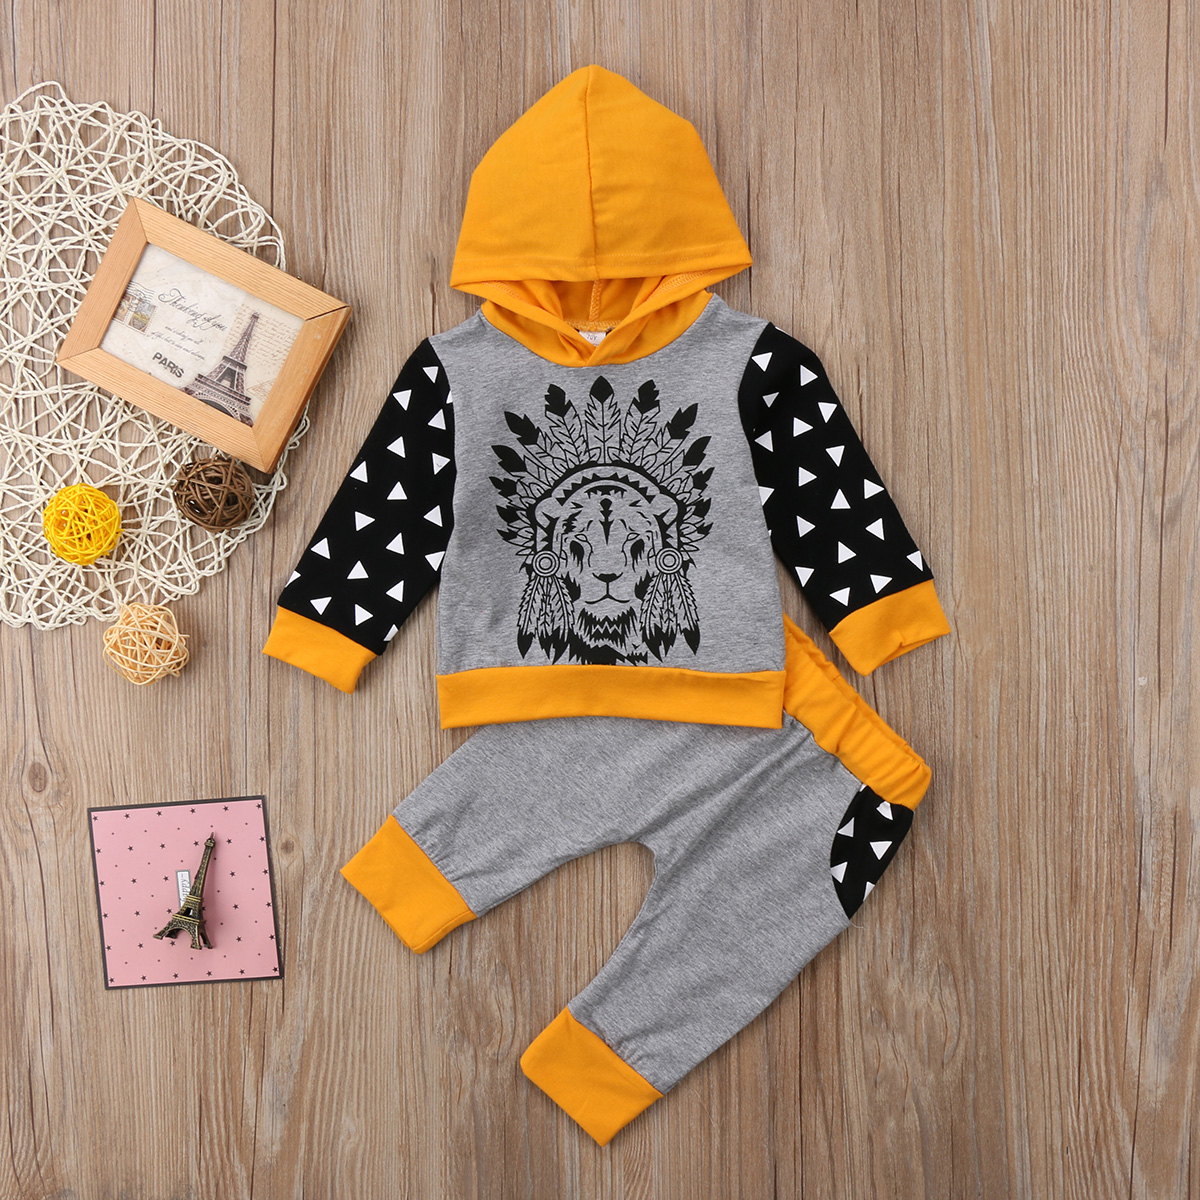 2PCS Pudcoco HOT SALE Cotton Toddler Baby Boys Girl Hoodie Long Sleeve T-Shirt Pants Fashion Set Clothes 0-24M